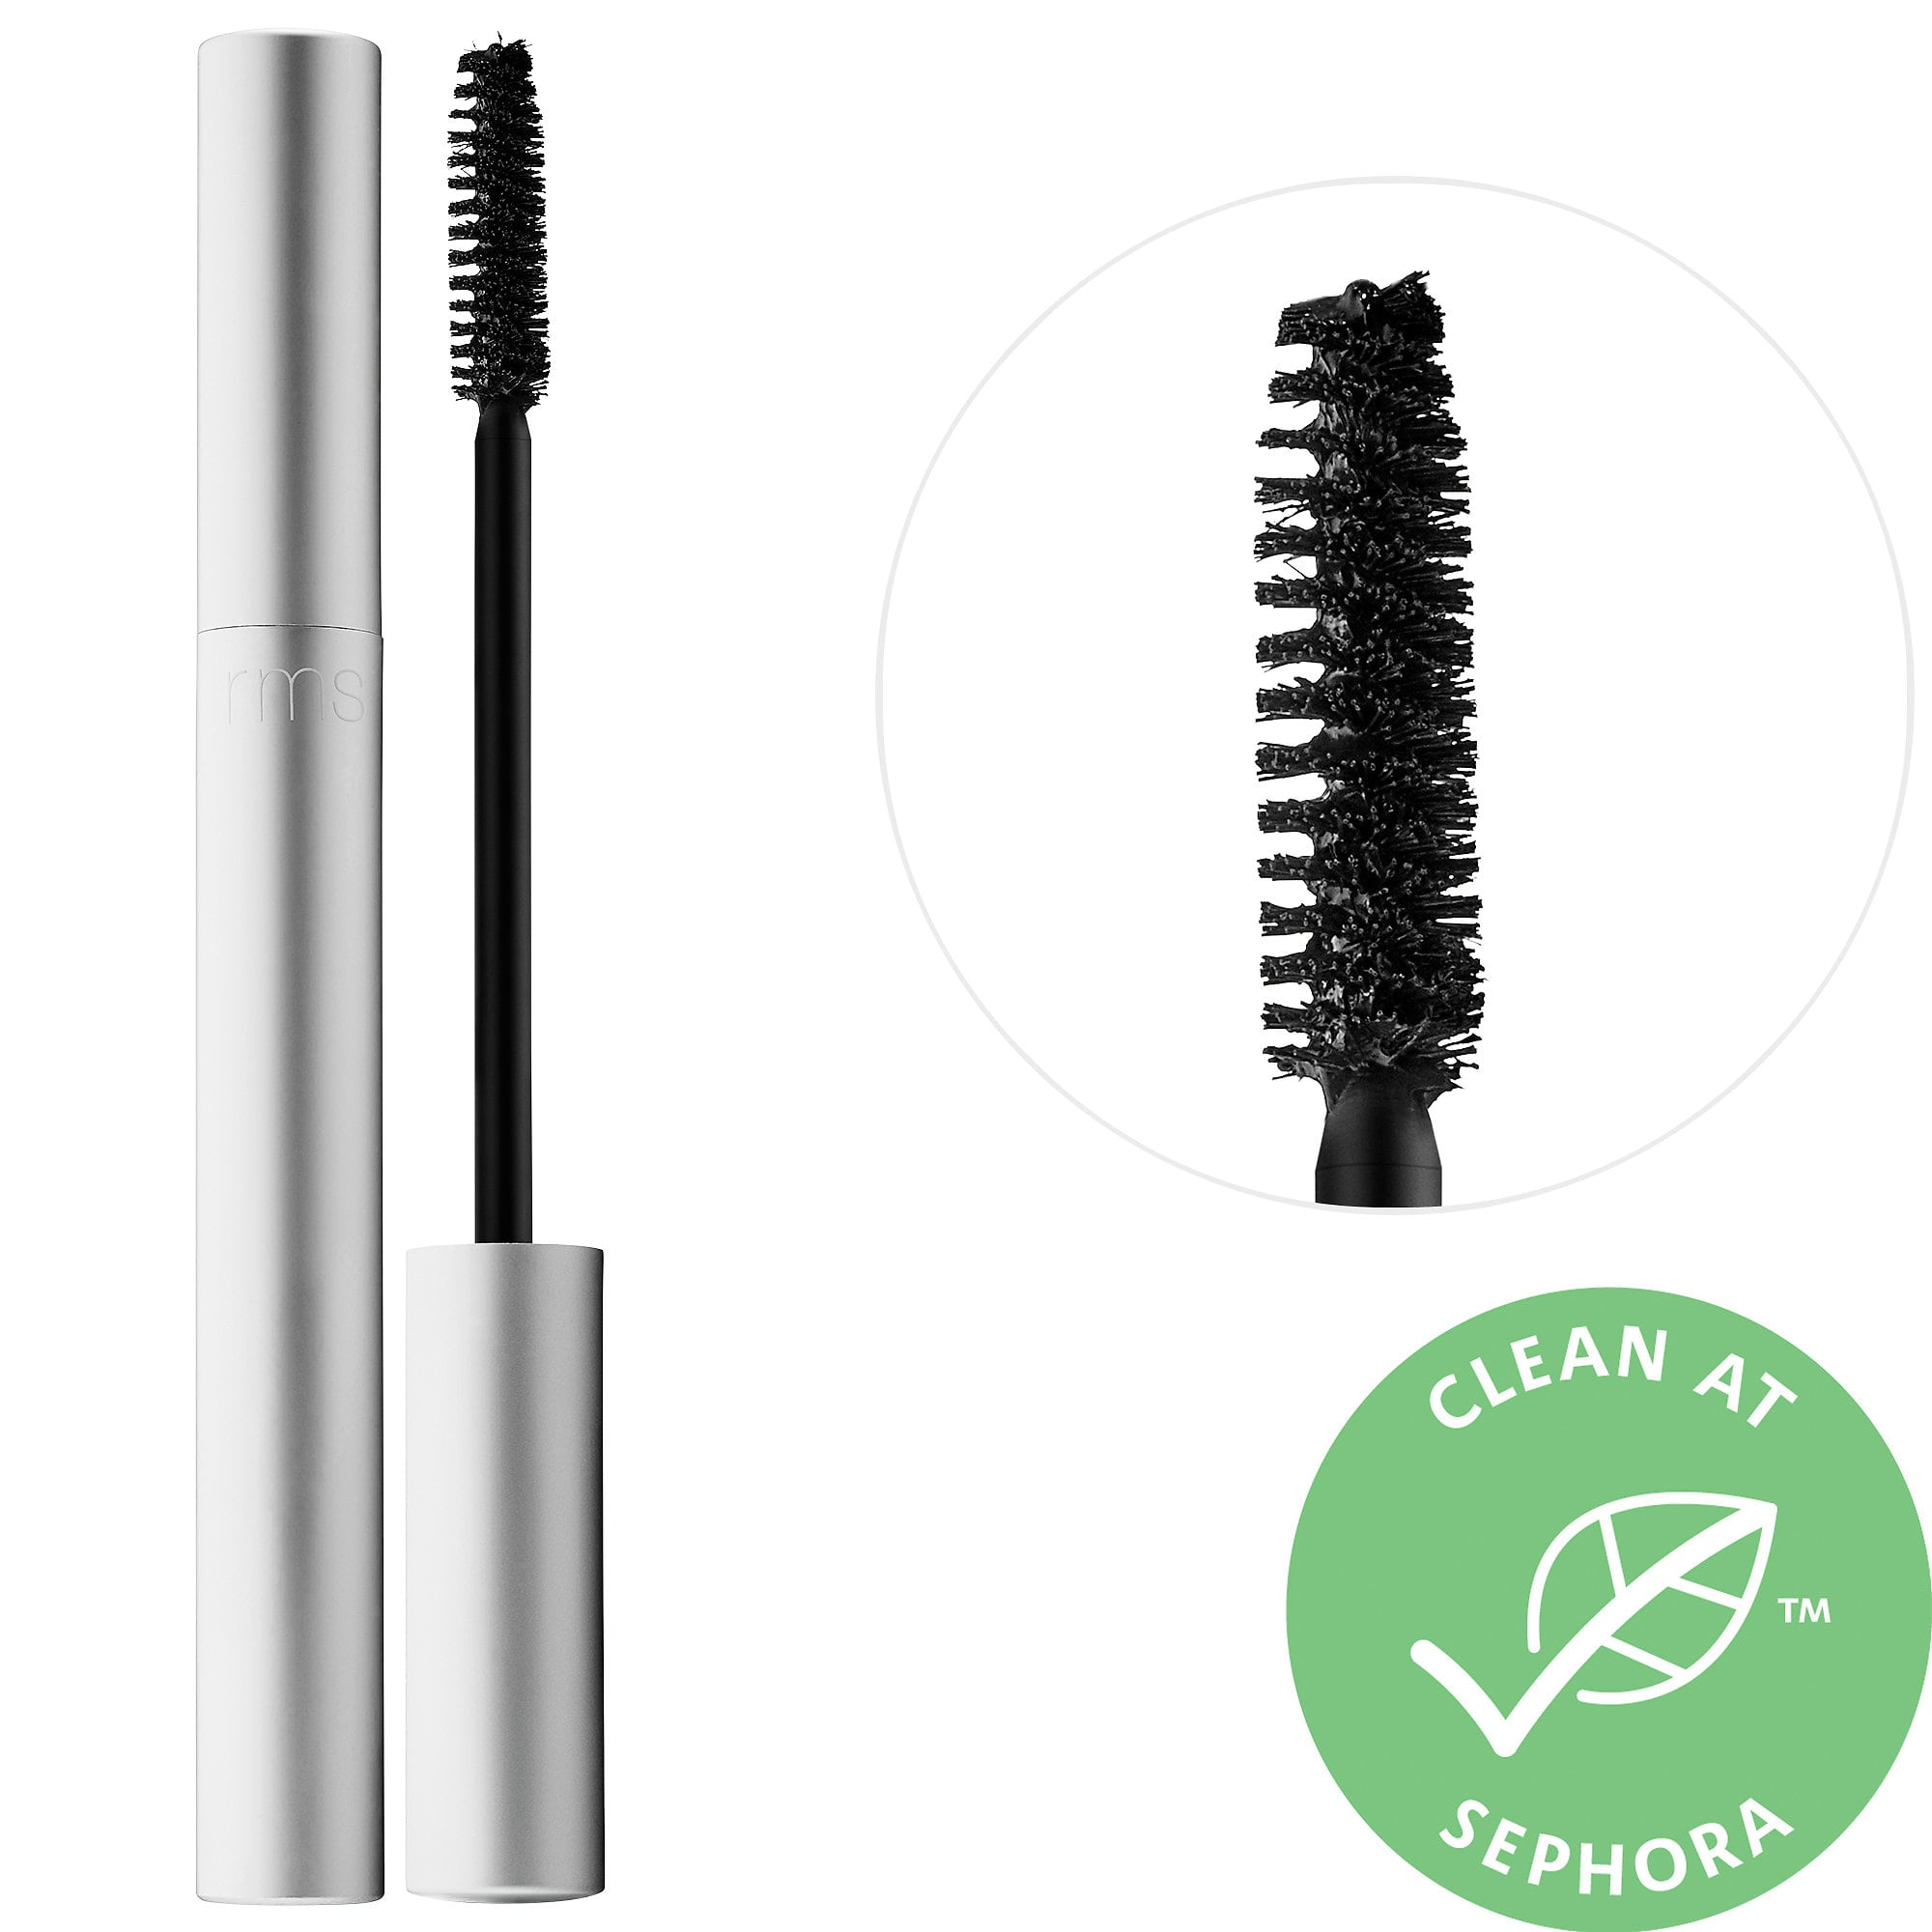 eccd3f6aafe rms beauty Volumizing Mascara 0.23 oz/ 7 mL | Products in 2019 ...